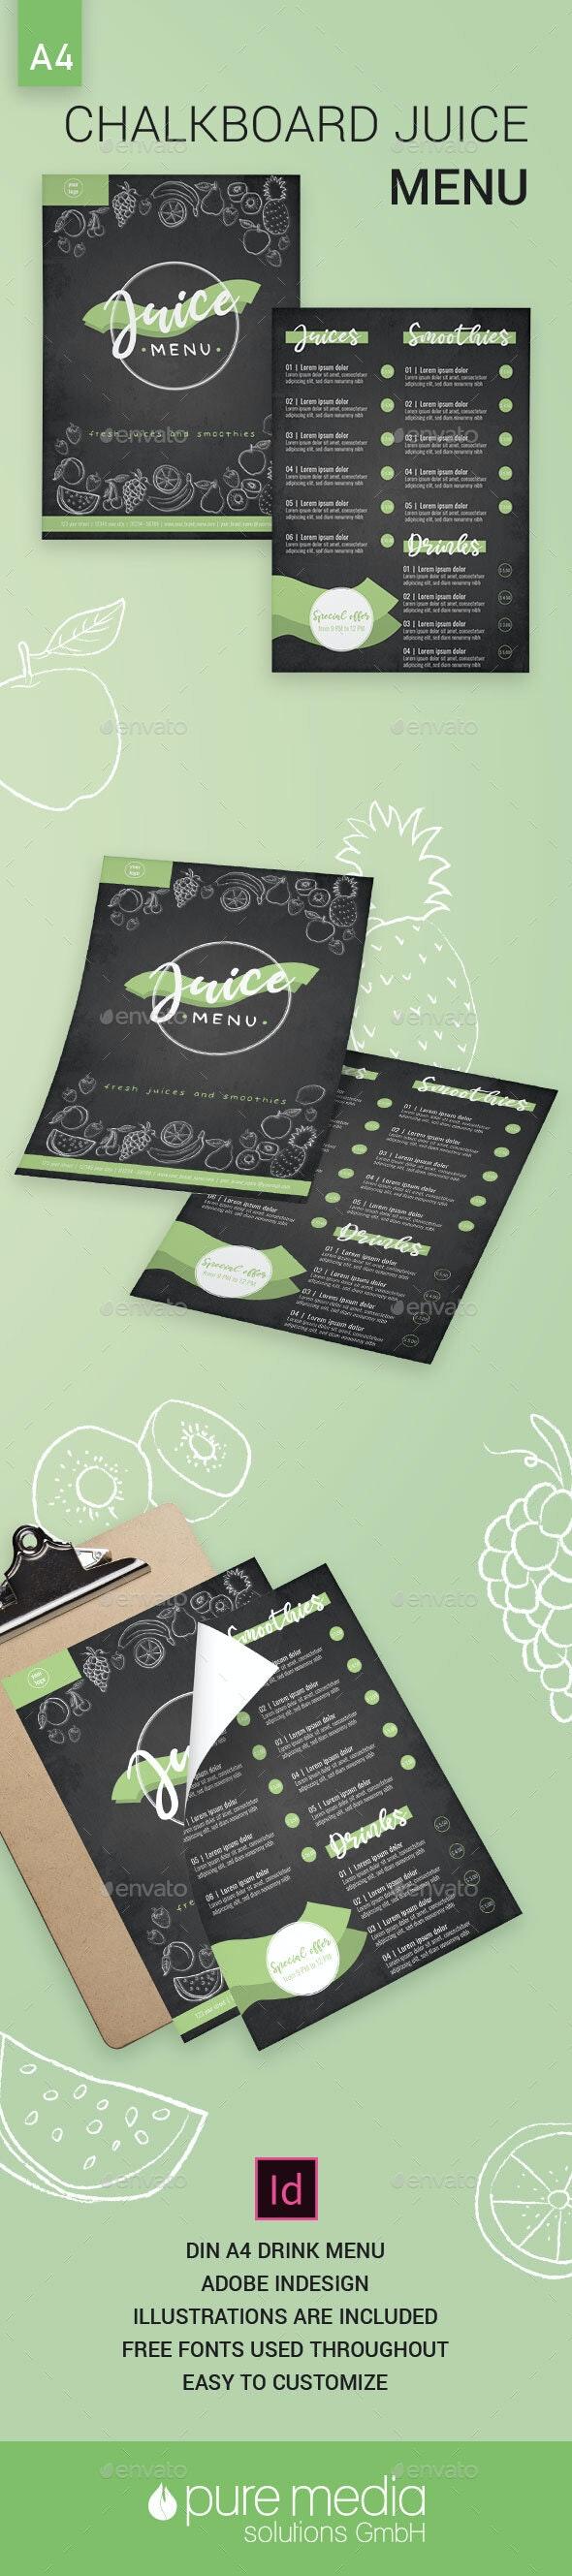 Chalkboard Juice Menu - Food Menus Print Templates